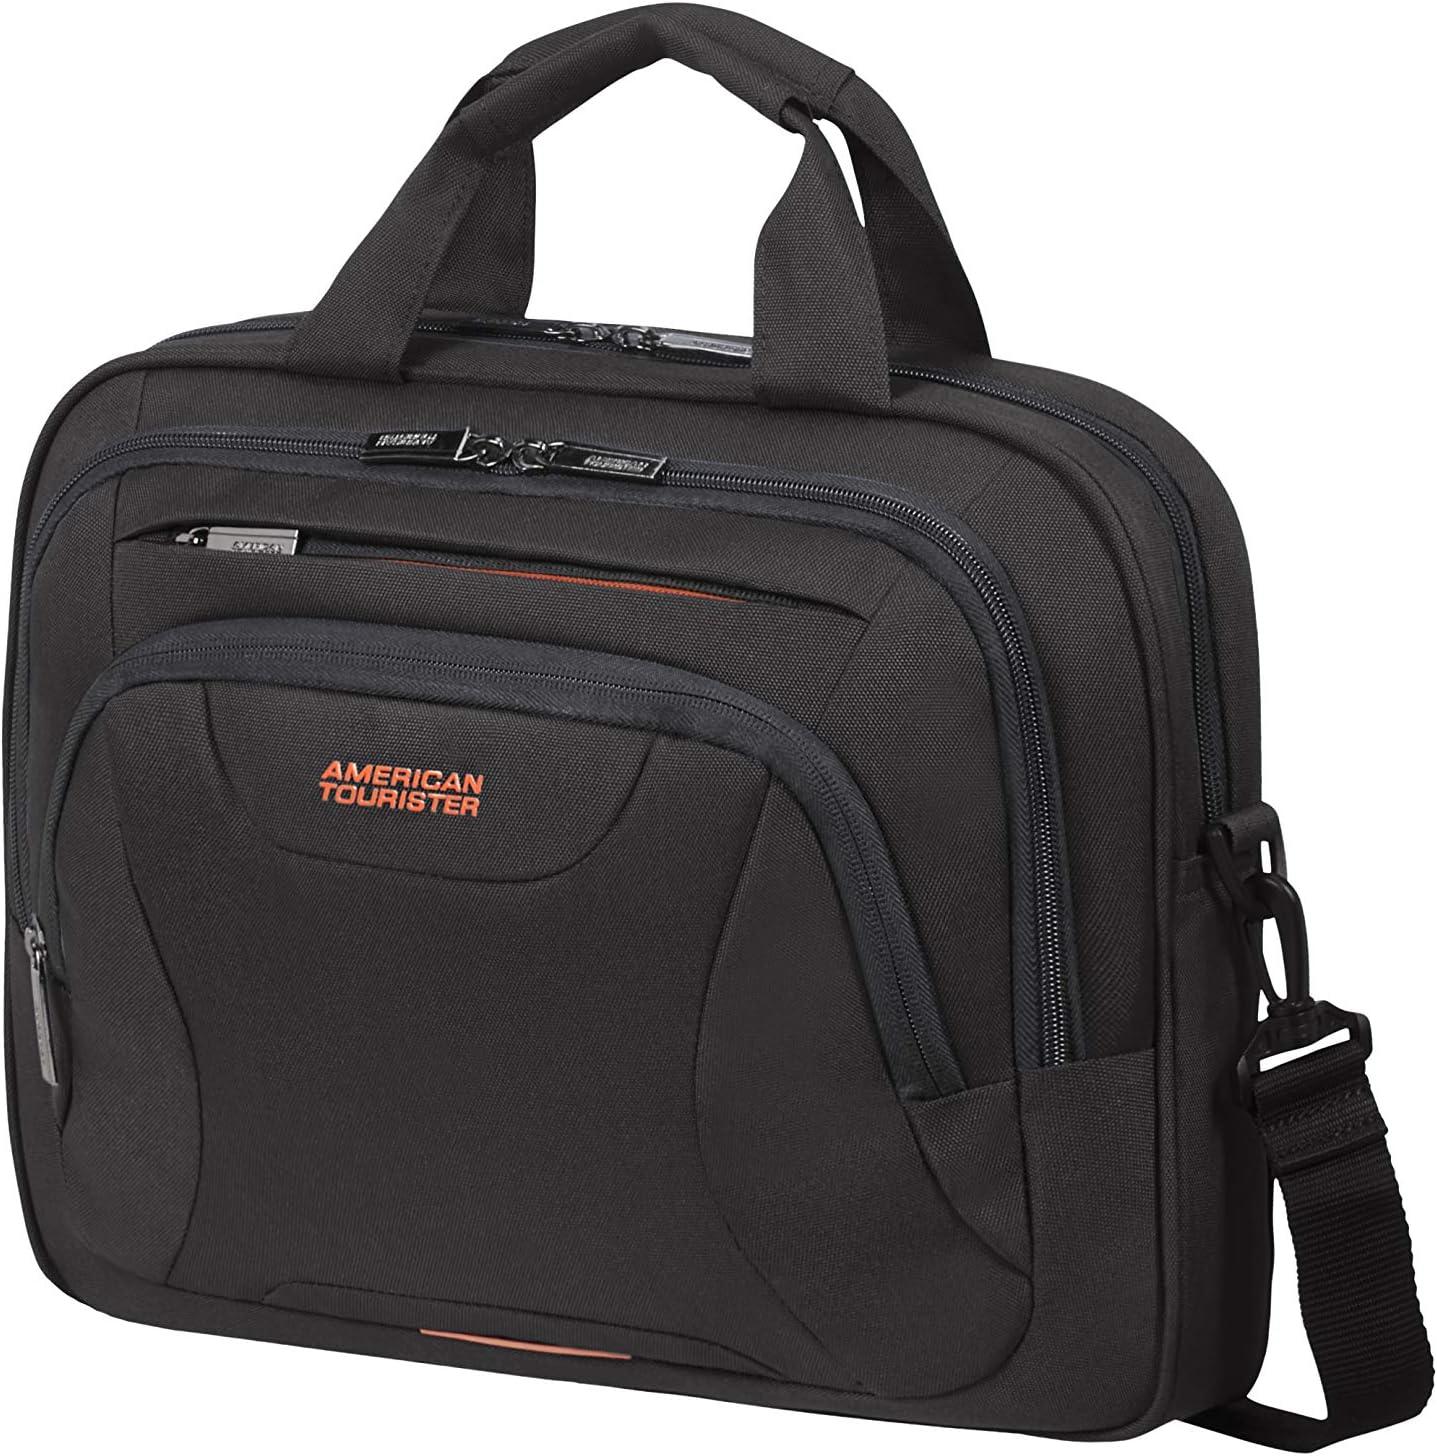 American Tourister At Work 39cm Briefcase, Black/Orange (Black) - 88531/1070